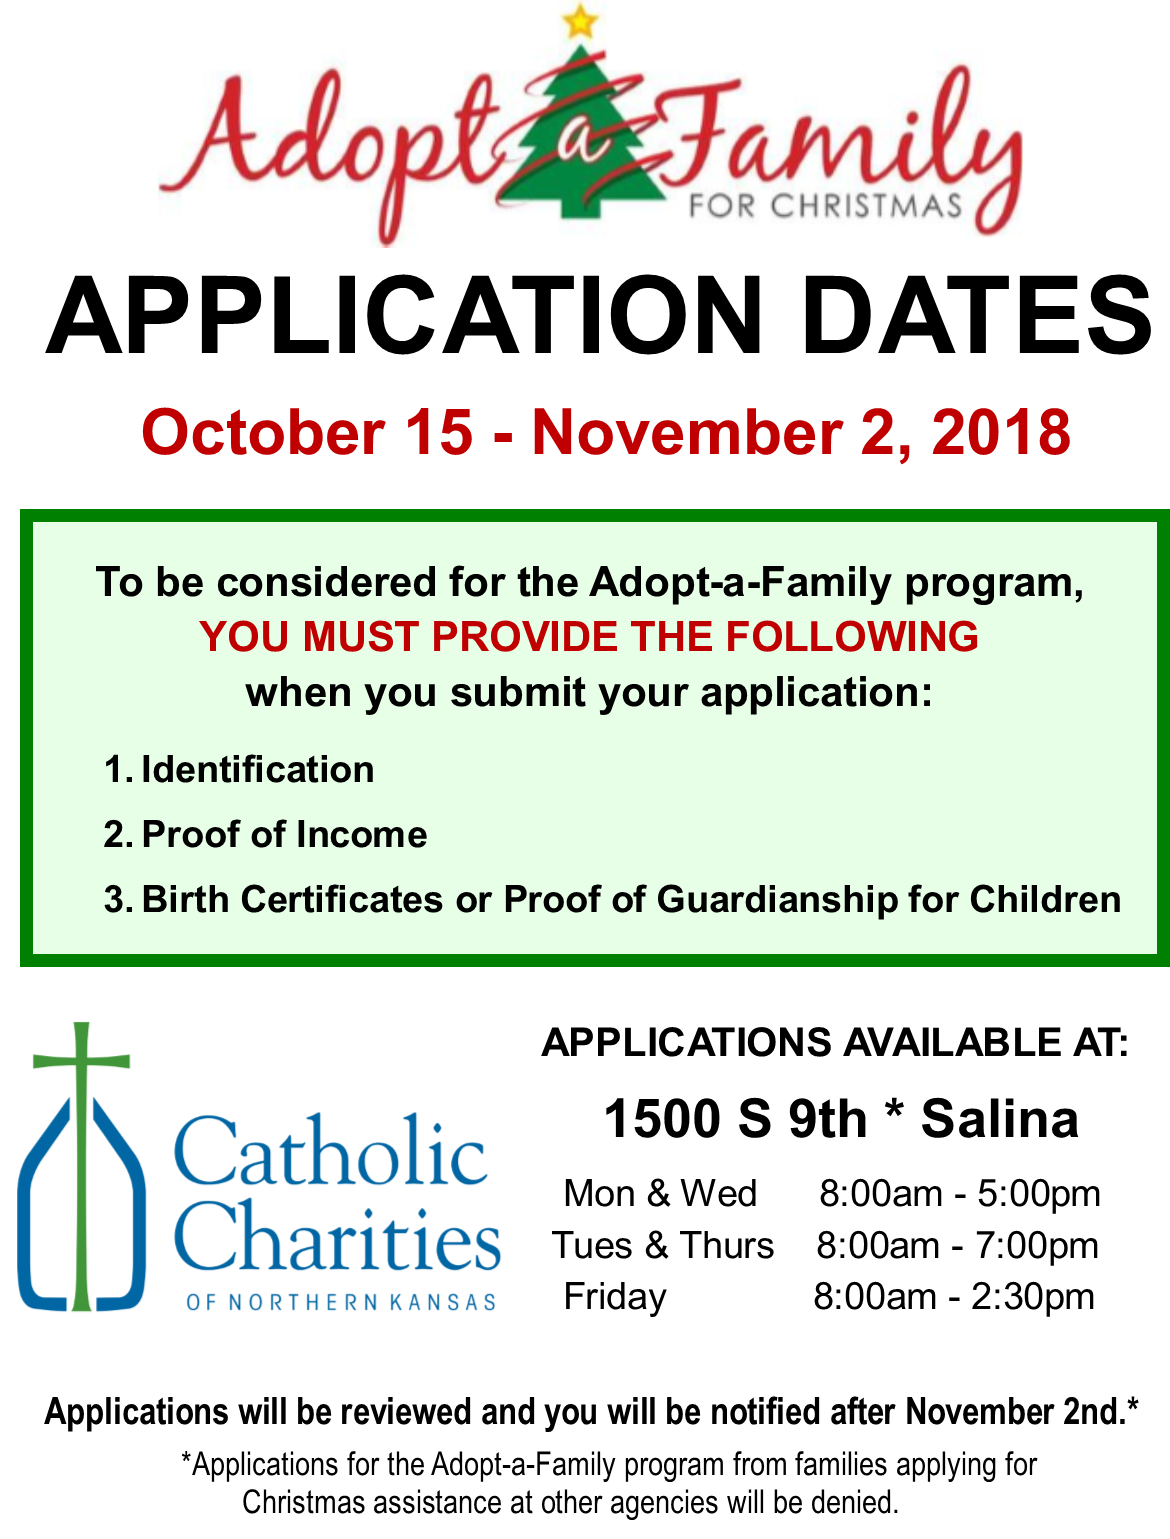 Adopt A Family For Christmas.Application Deadline Nears For Adopt A Family For Christmas